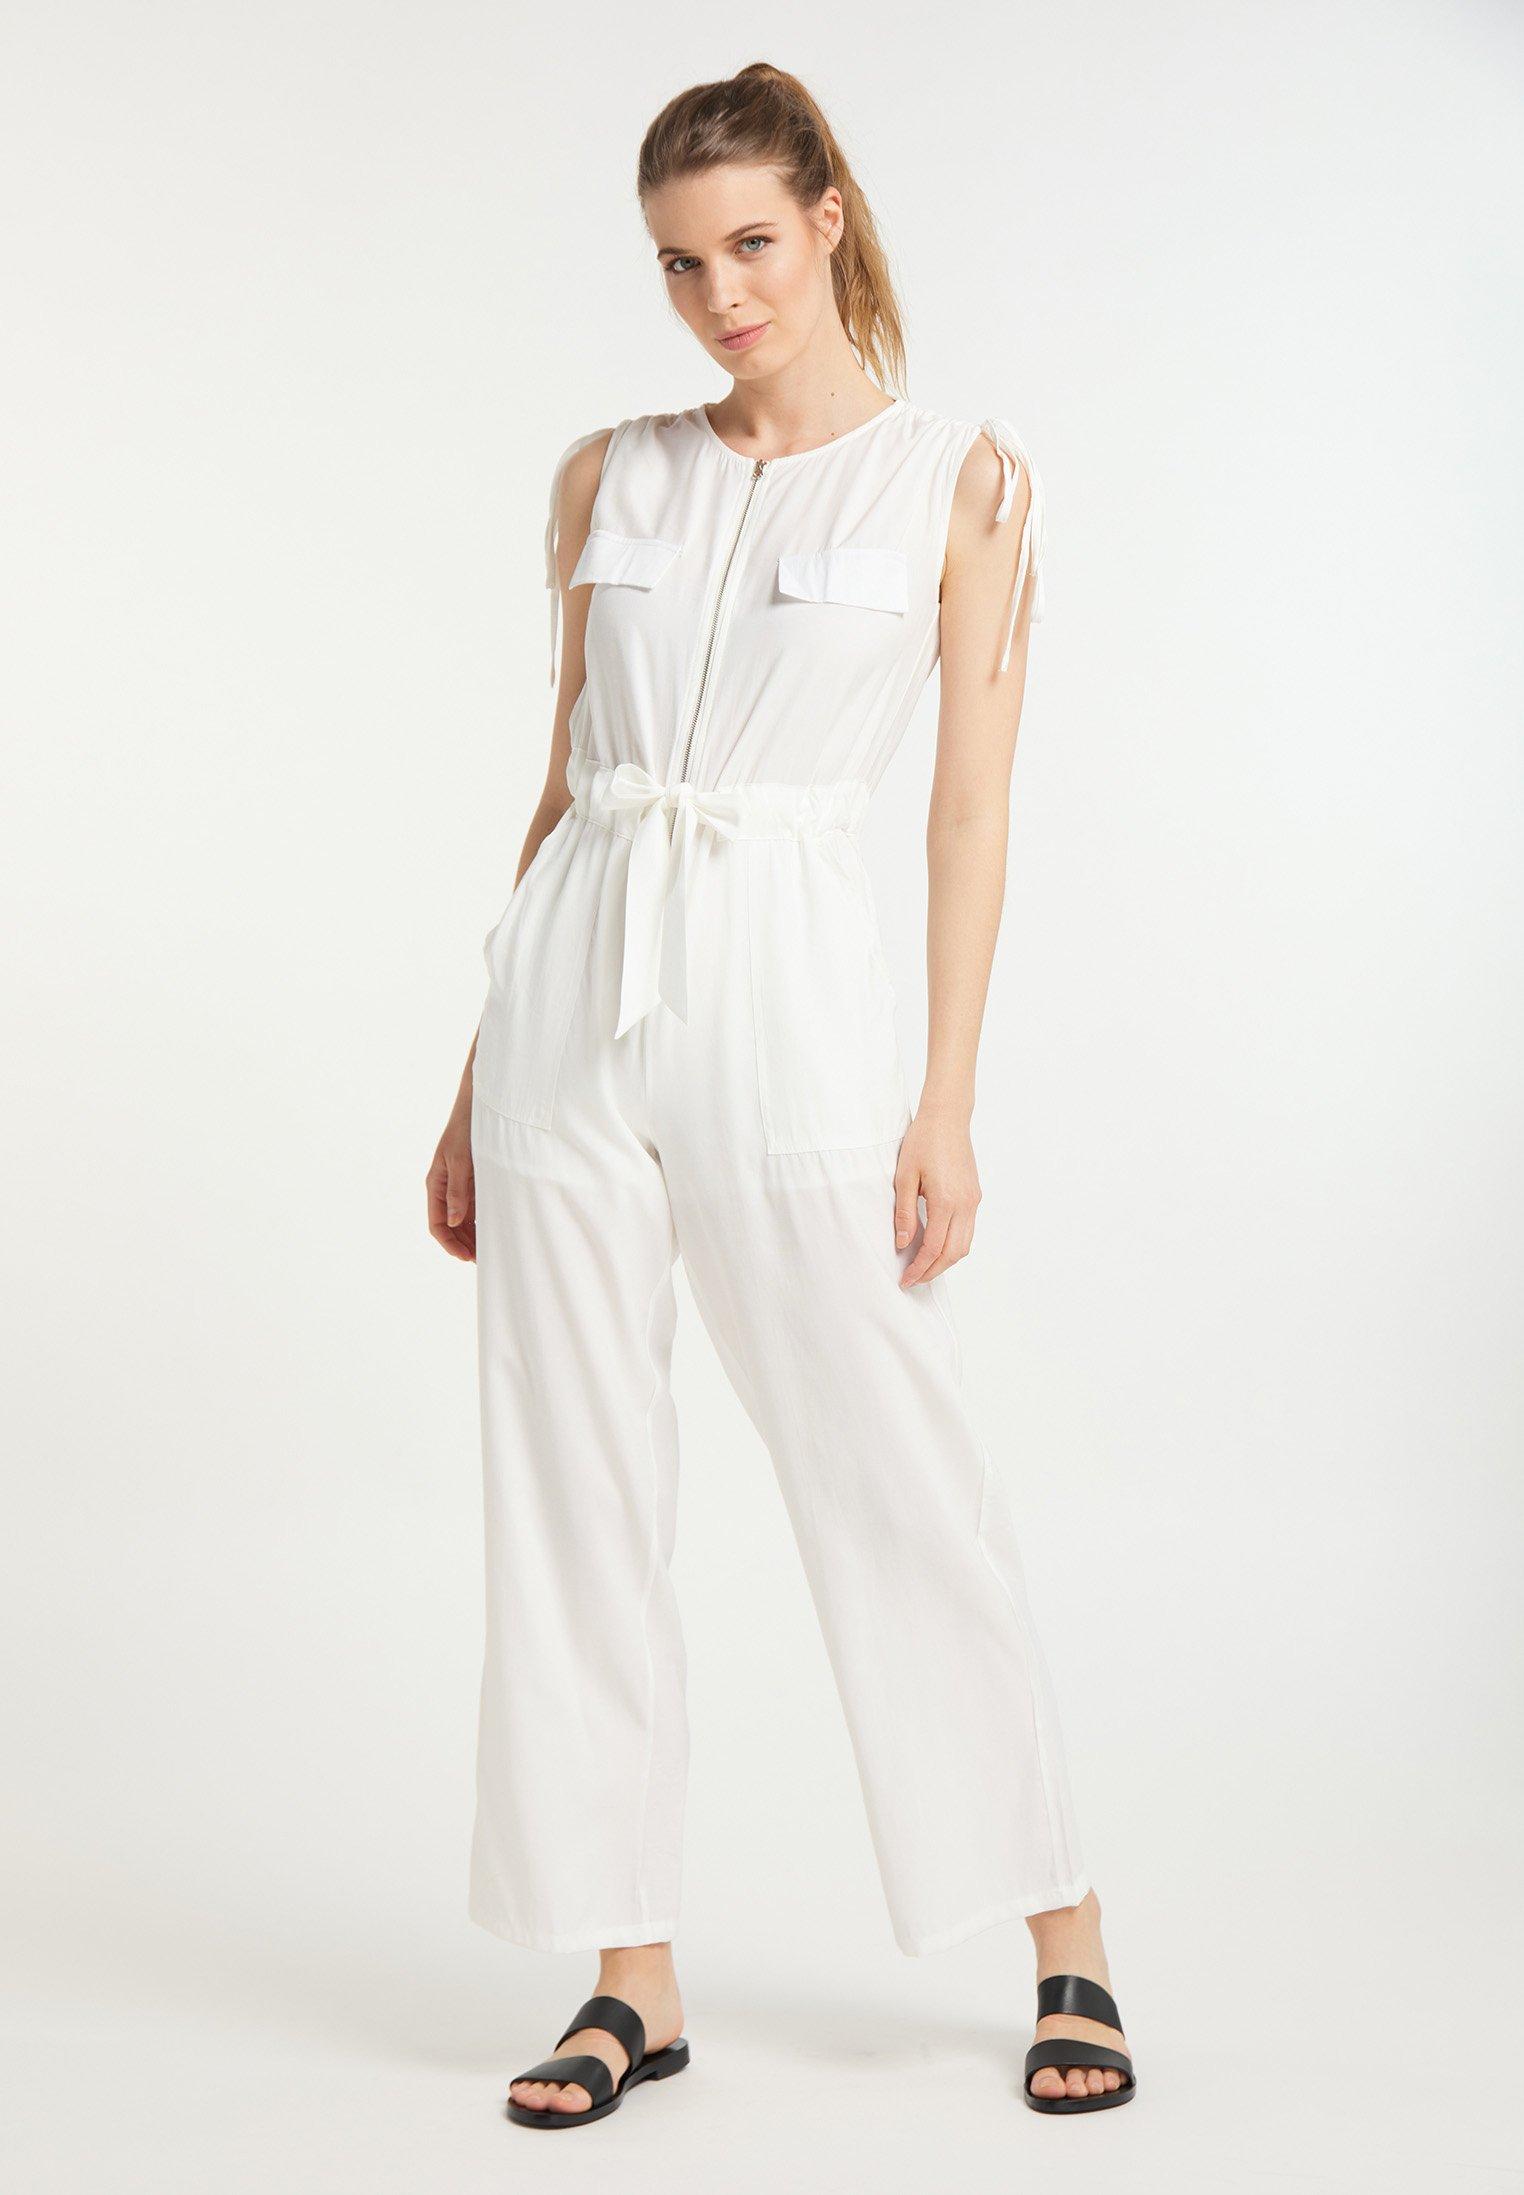 Buy Women's Clothing usha Jumpsuit wollweiss OPCuvGa7u